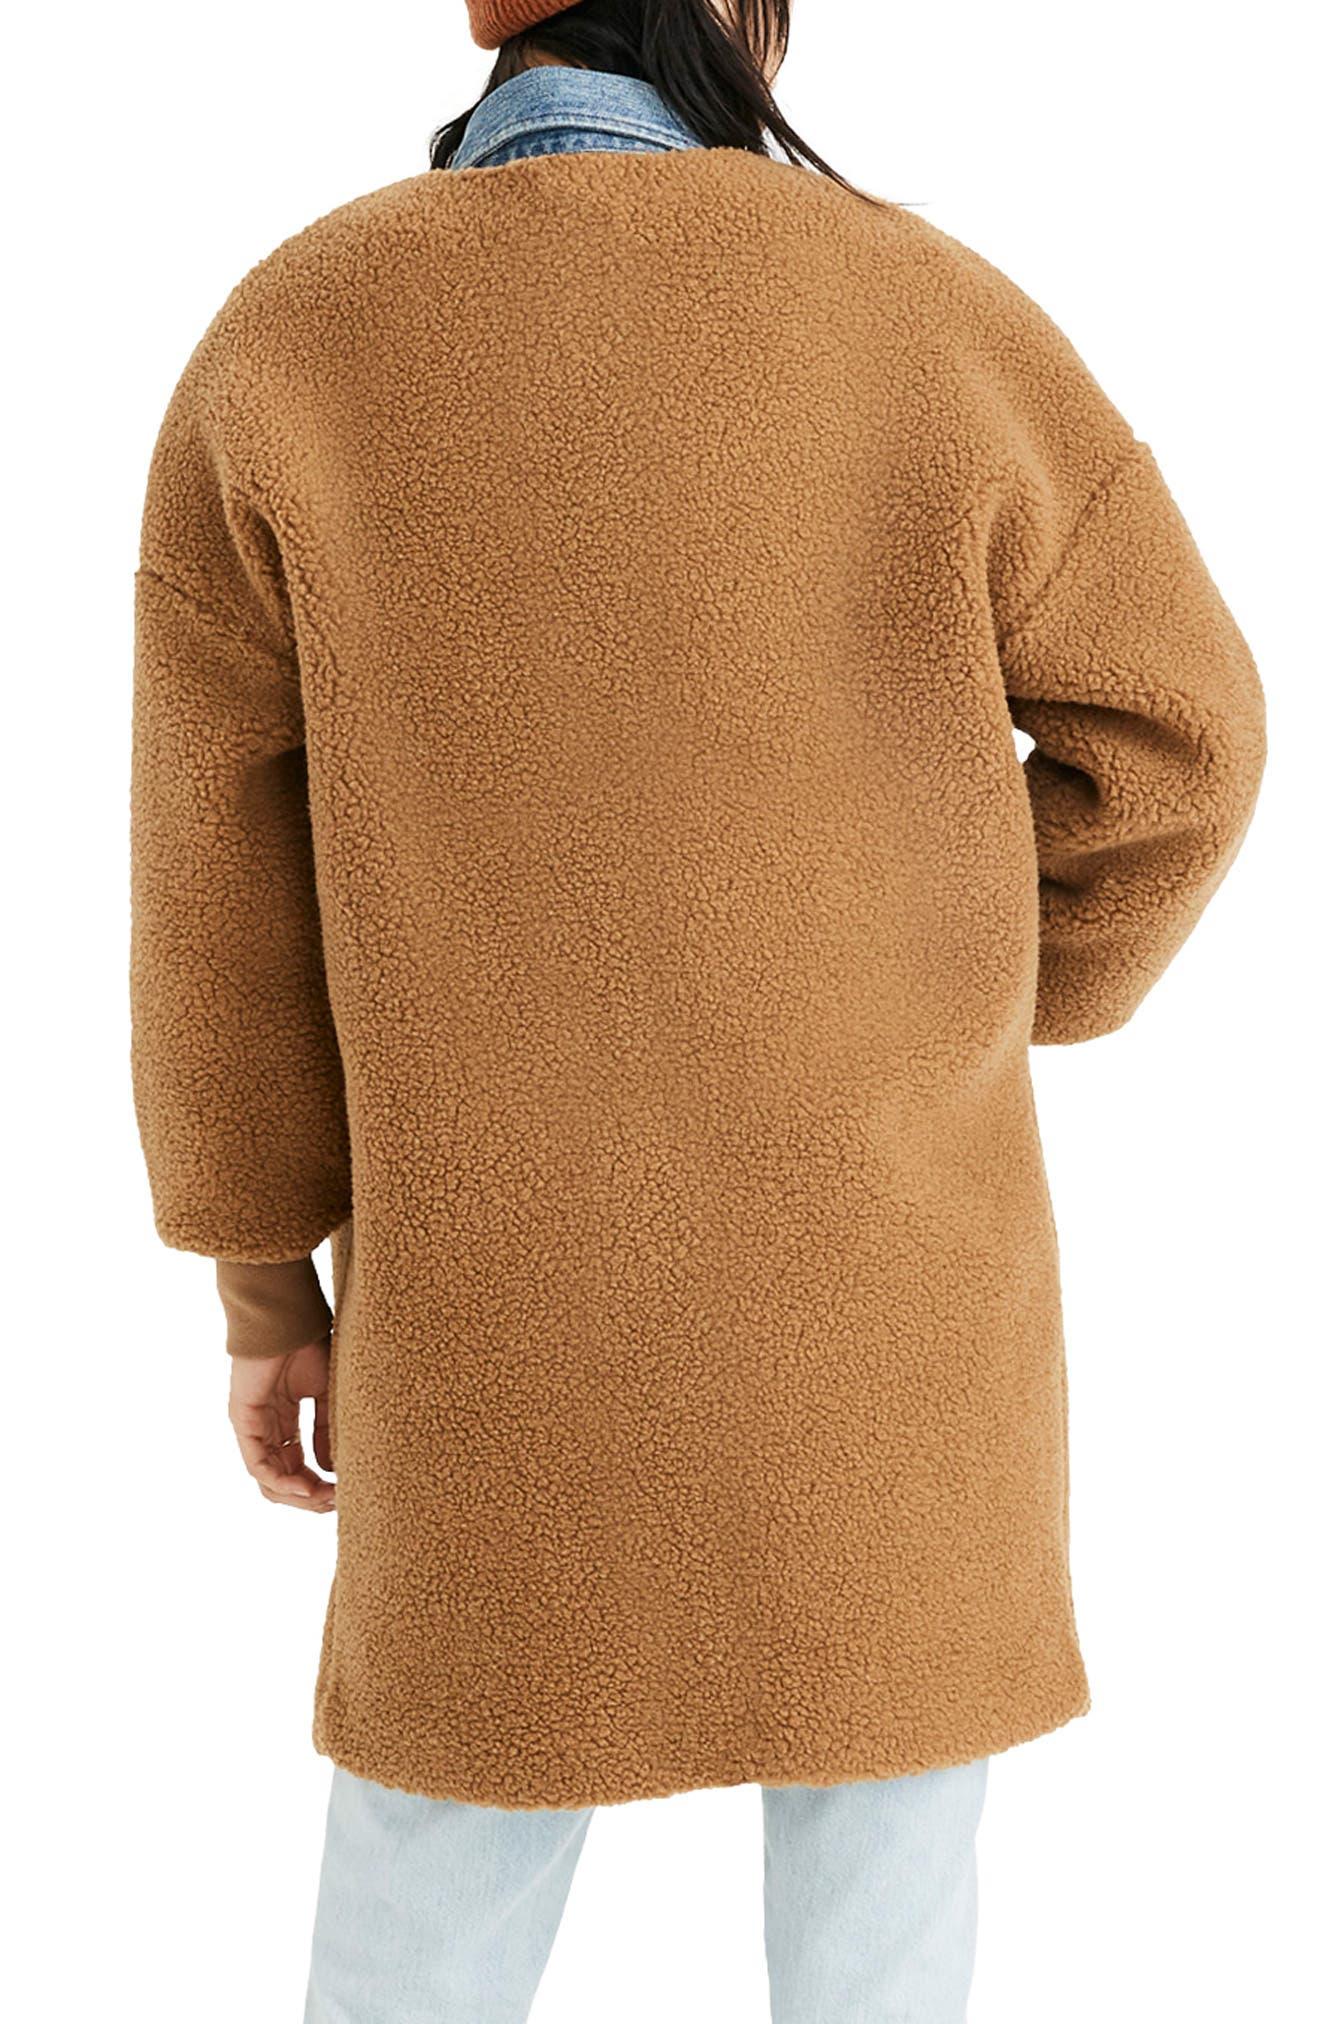 MADEWELL, Bonded Fleece Cocoon Coat, Alternate thumbnail 2, color, 200